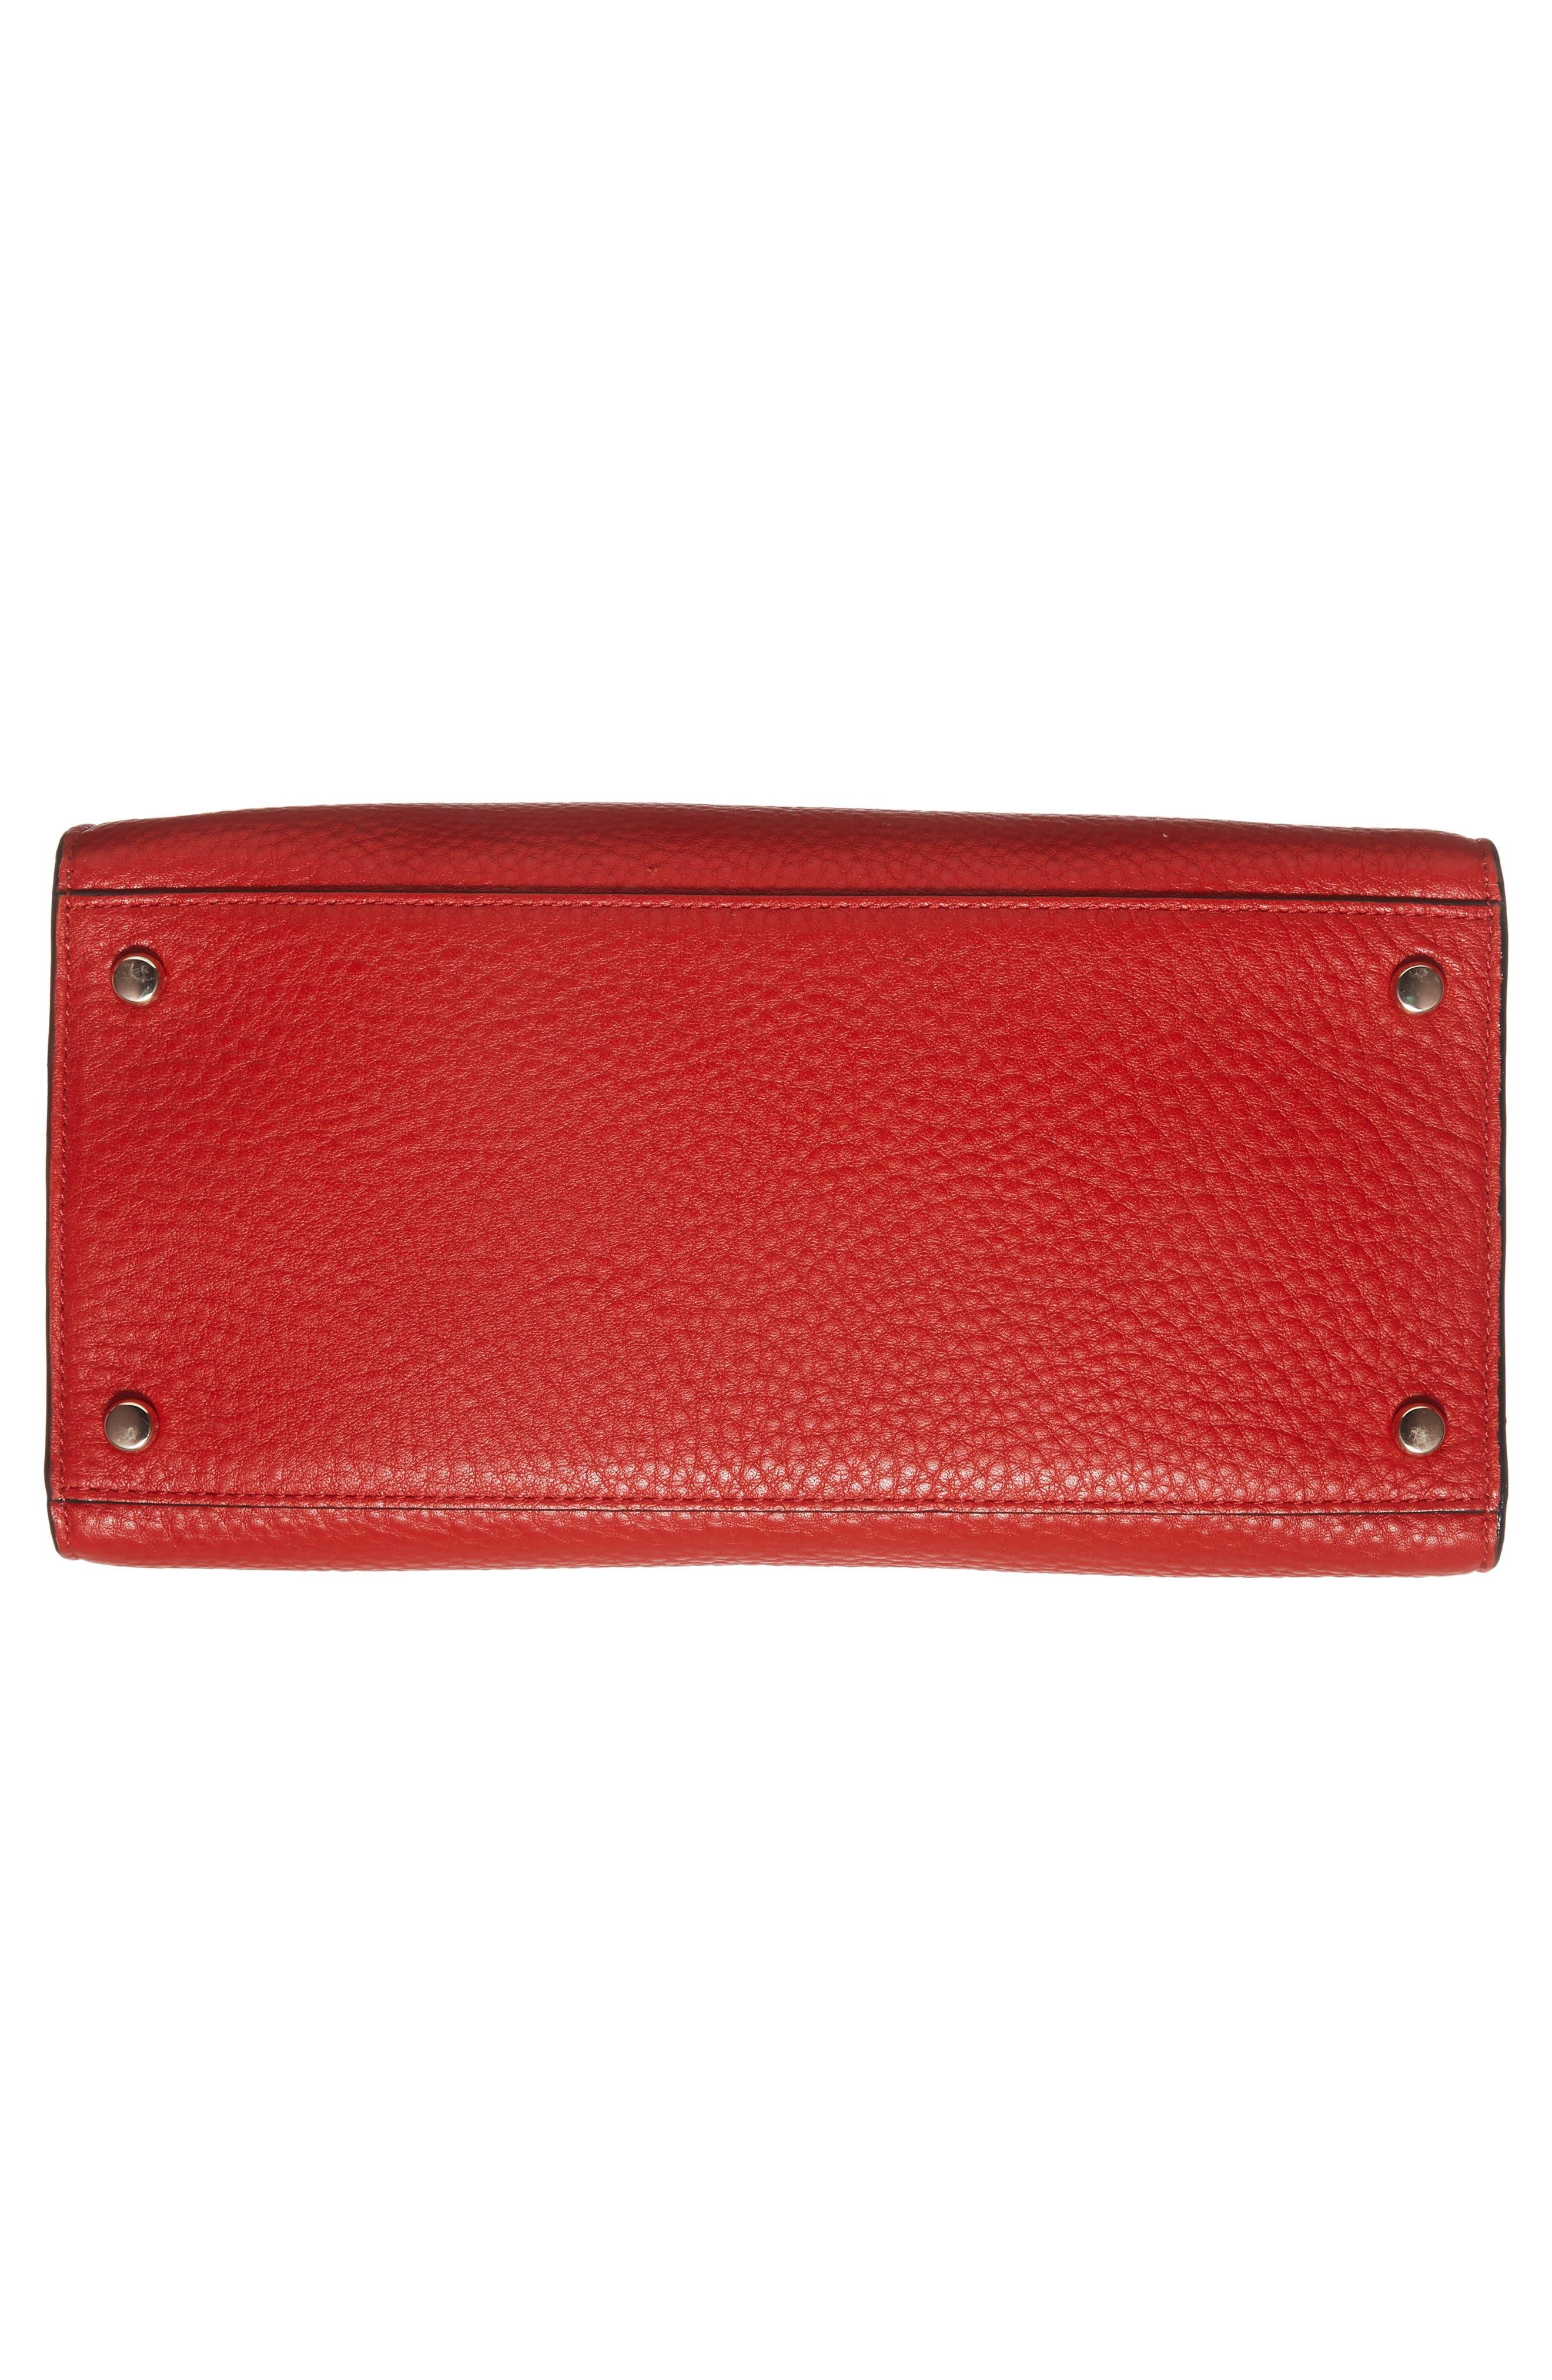 stewart street - little joy leather satchel,                             Alternate thumbnail 5, color,                             631